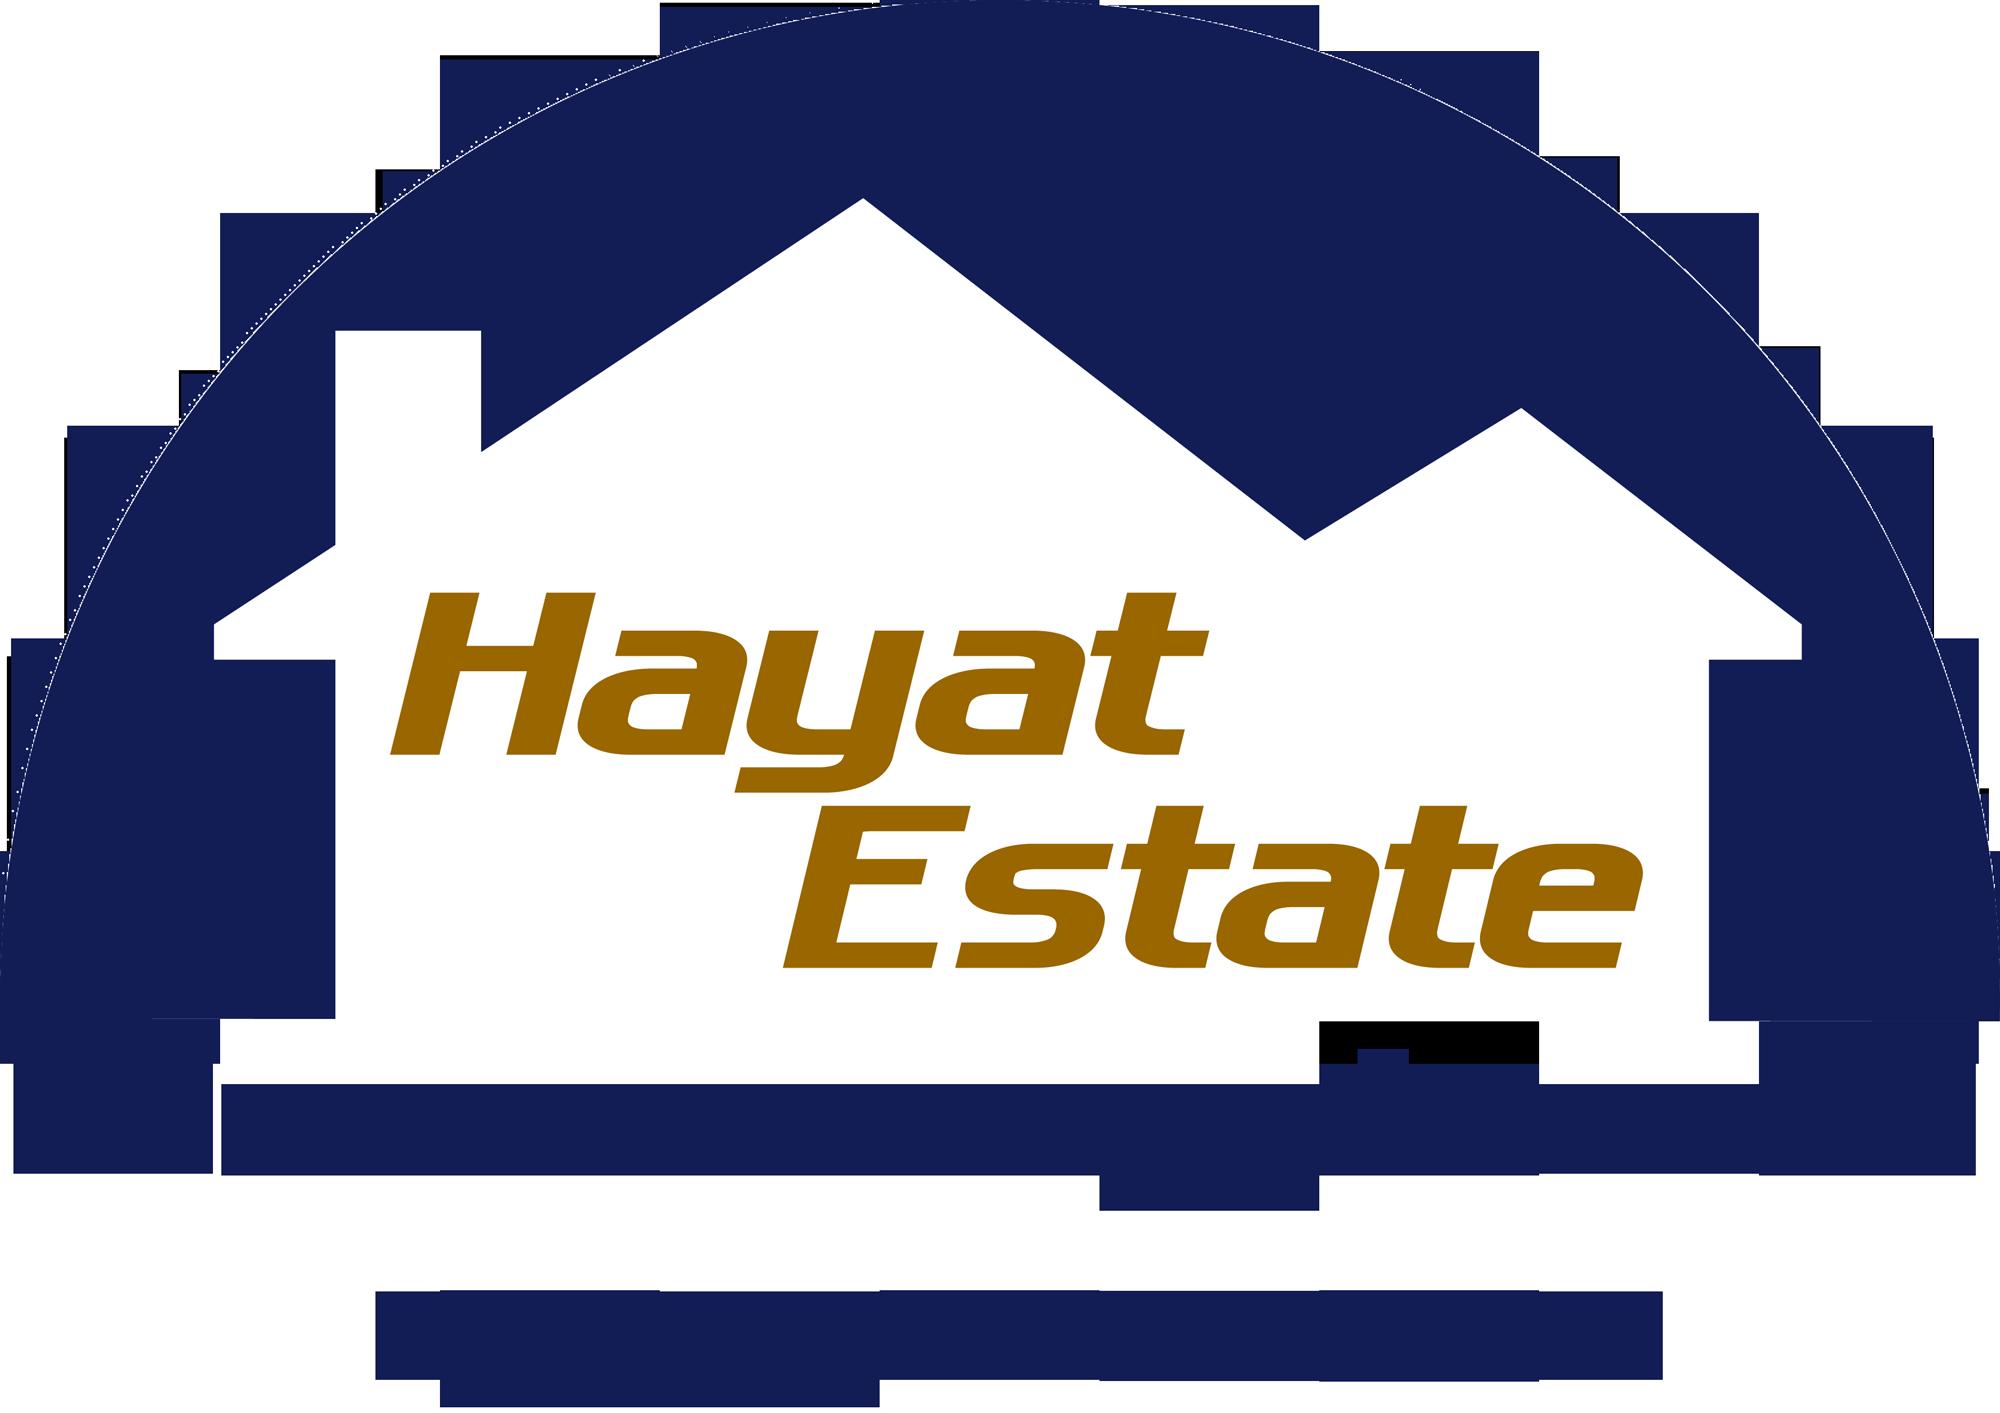 logo_proz_s_nadpisju_big_1_.png